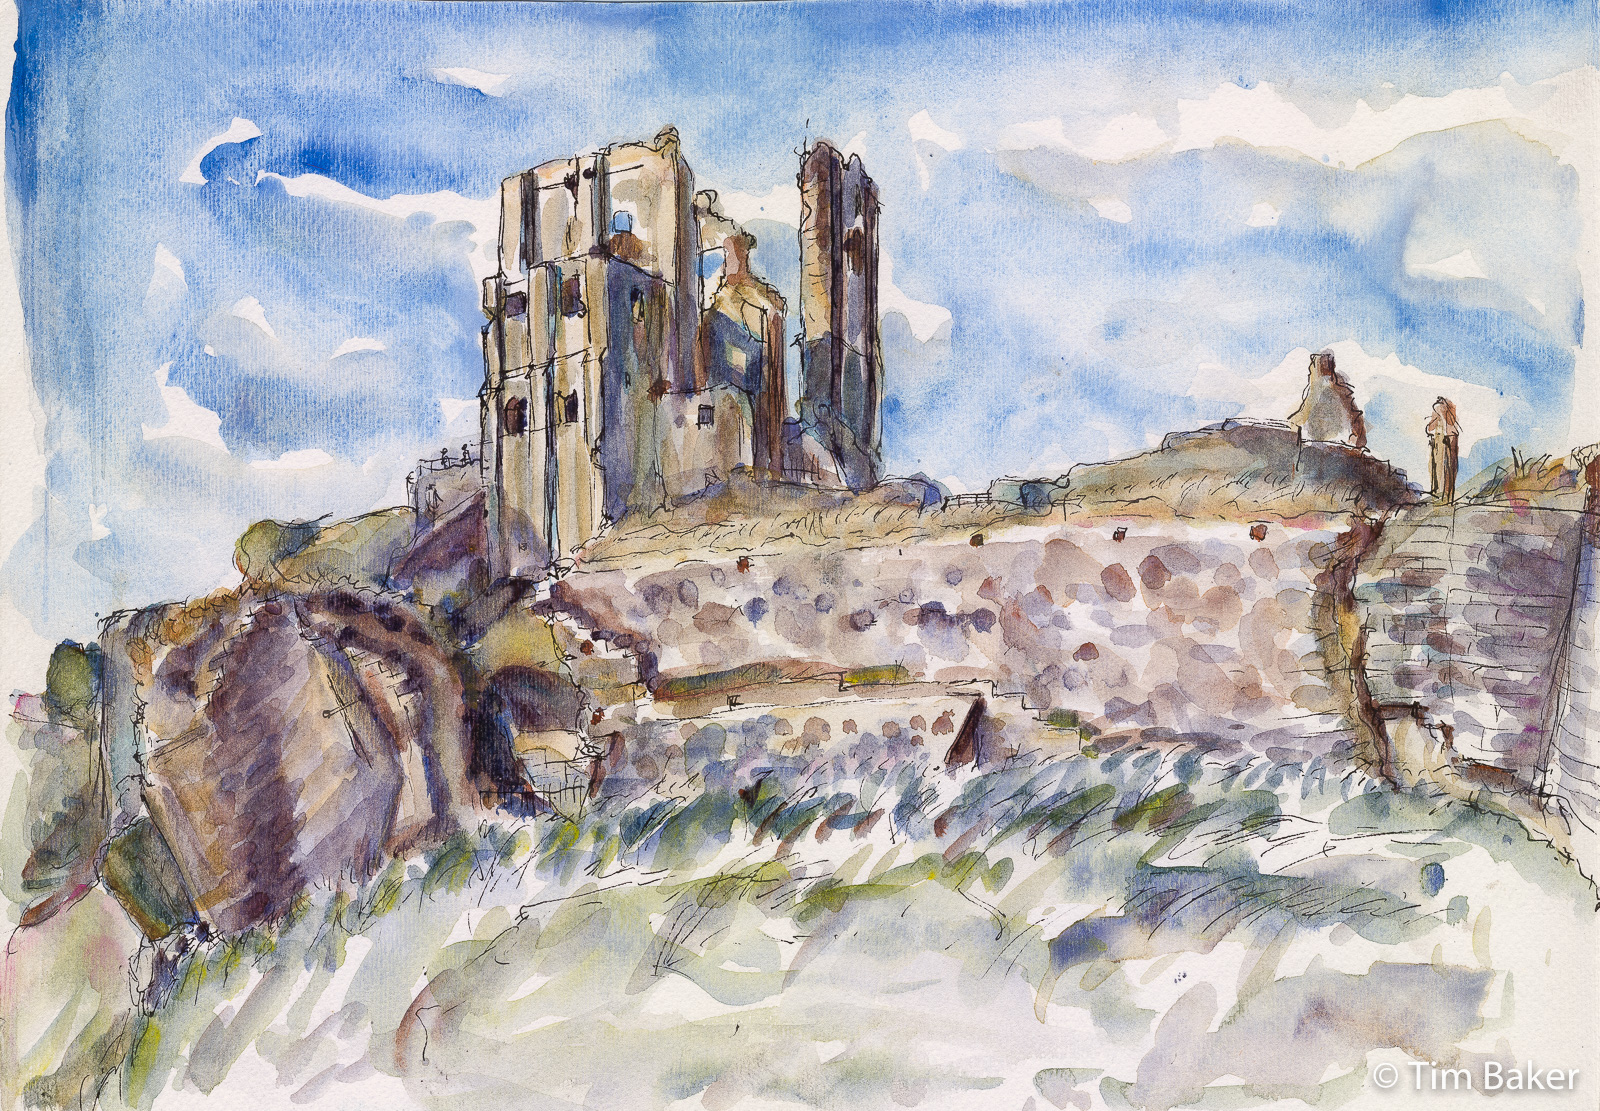 2021-Jurassic-Coast-Weymouth-to-Swanage-Corfe-Castle-Tea-Room-Watercolour-1-Pano.jpg